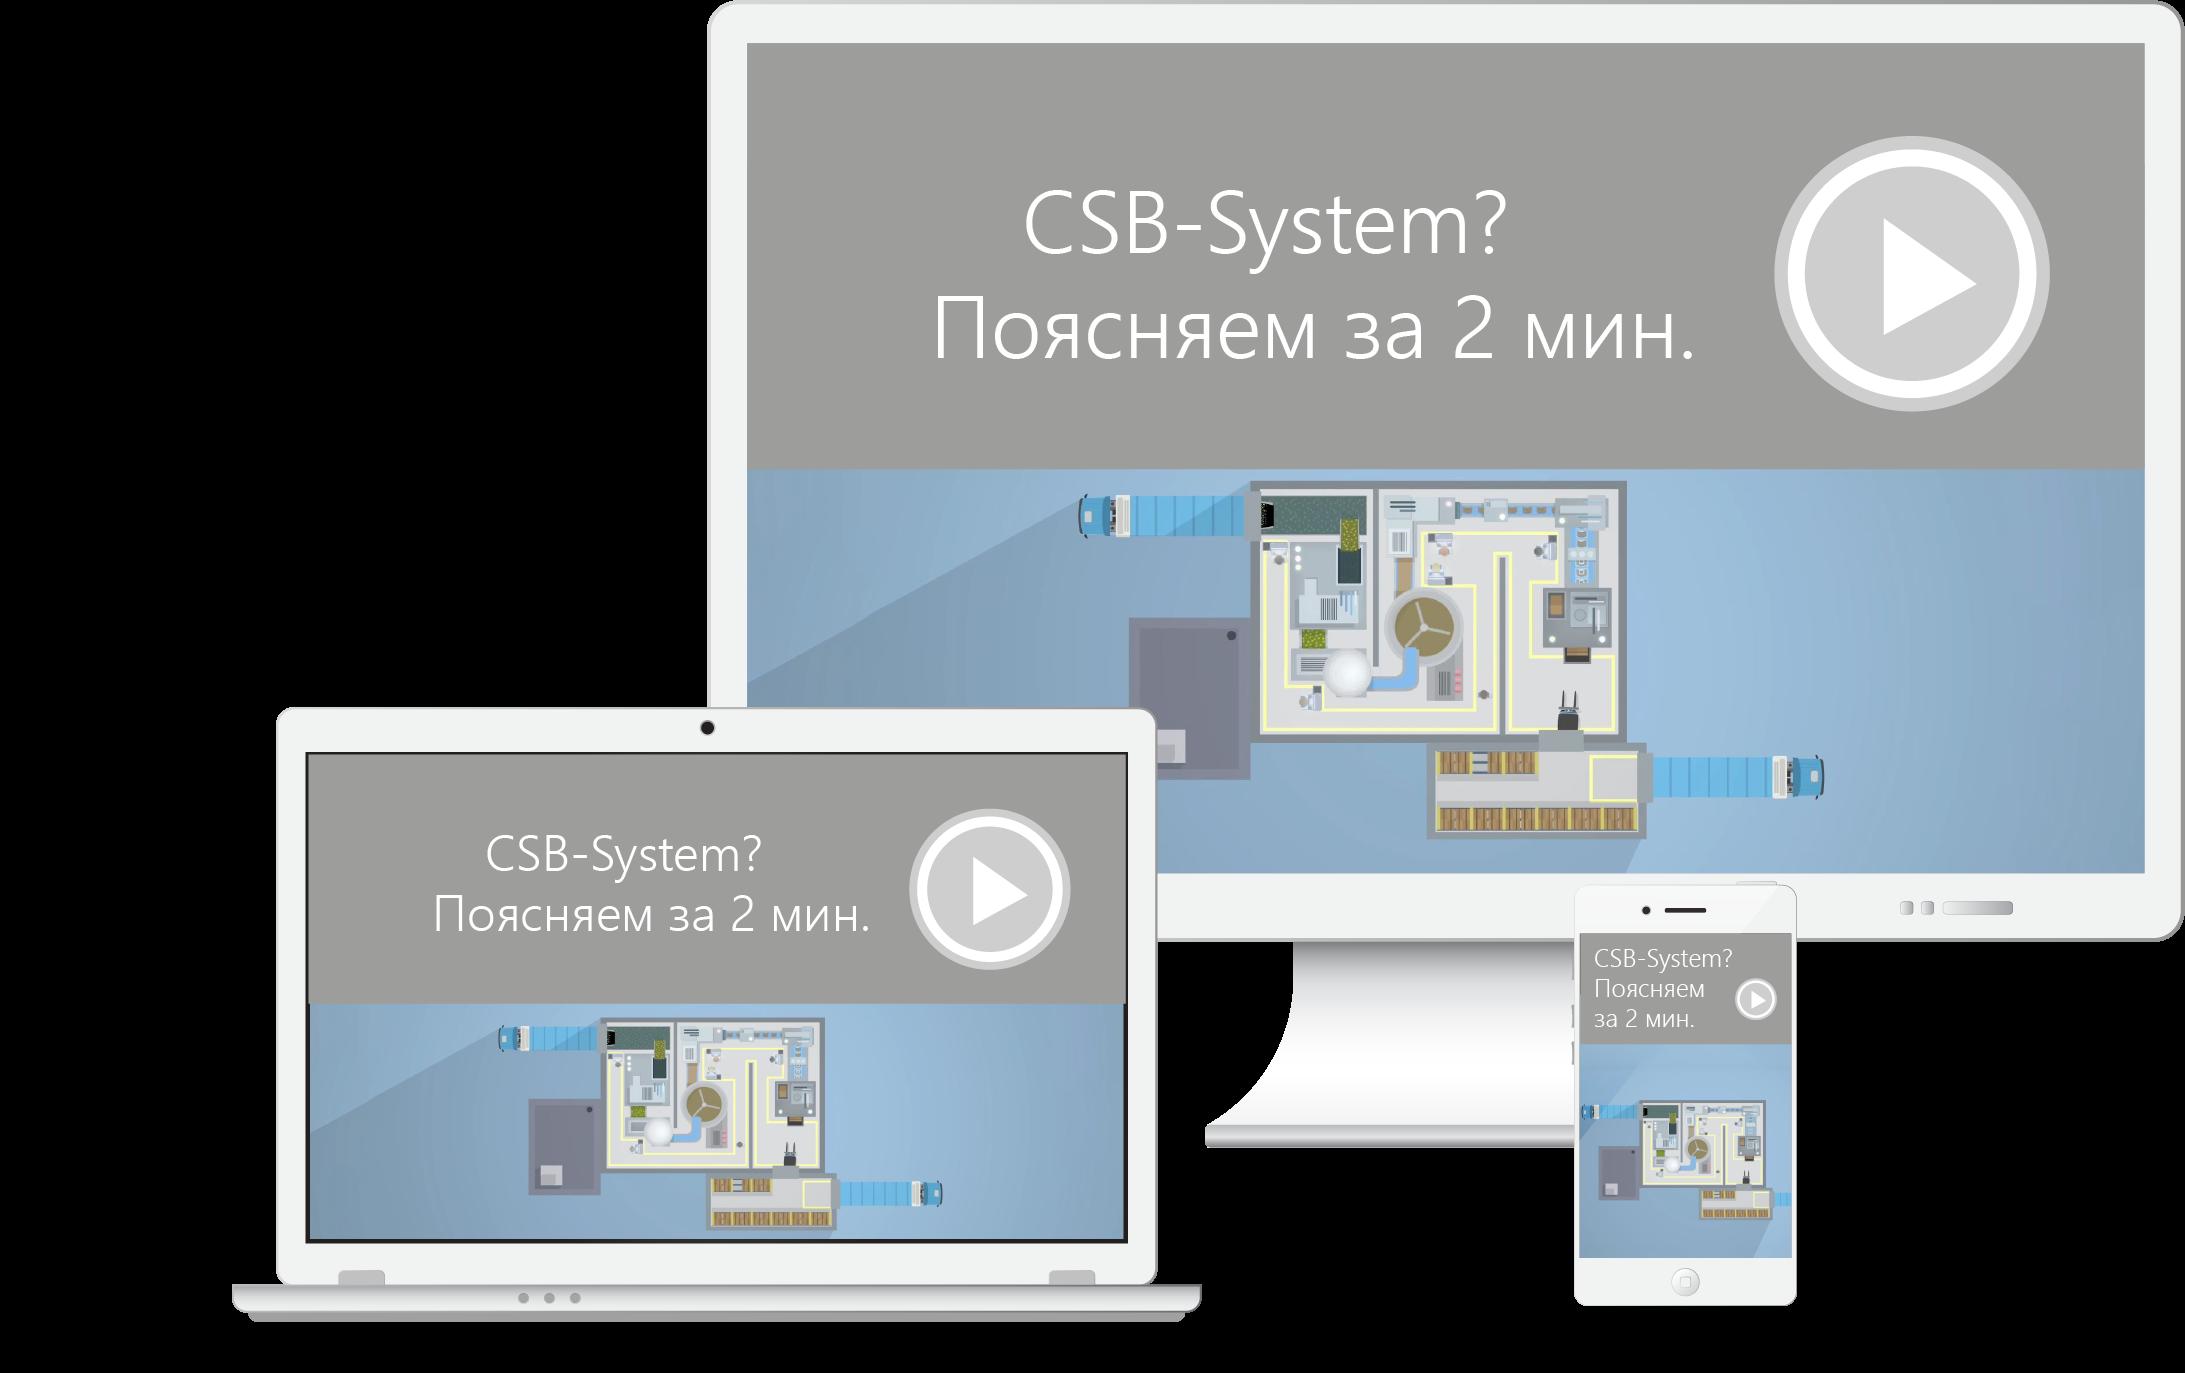 RUS_Softwarelösungen_Video_Monitore-18.png